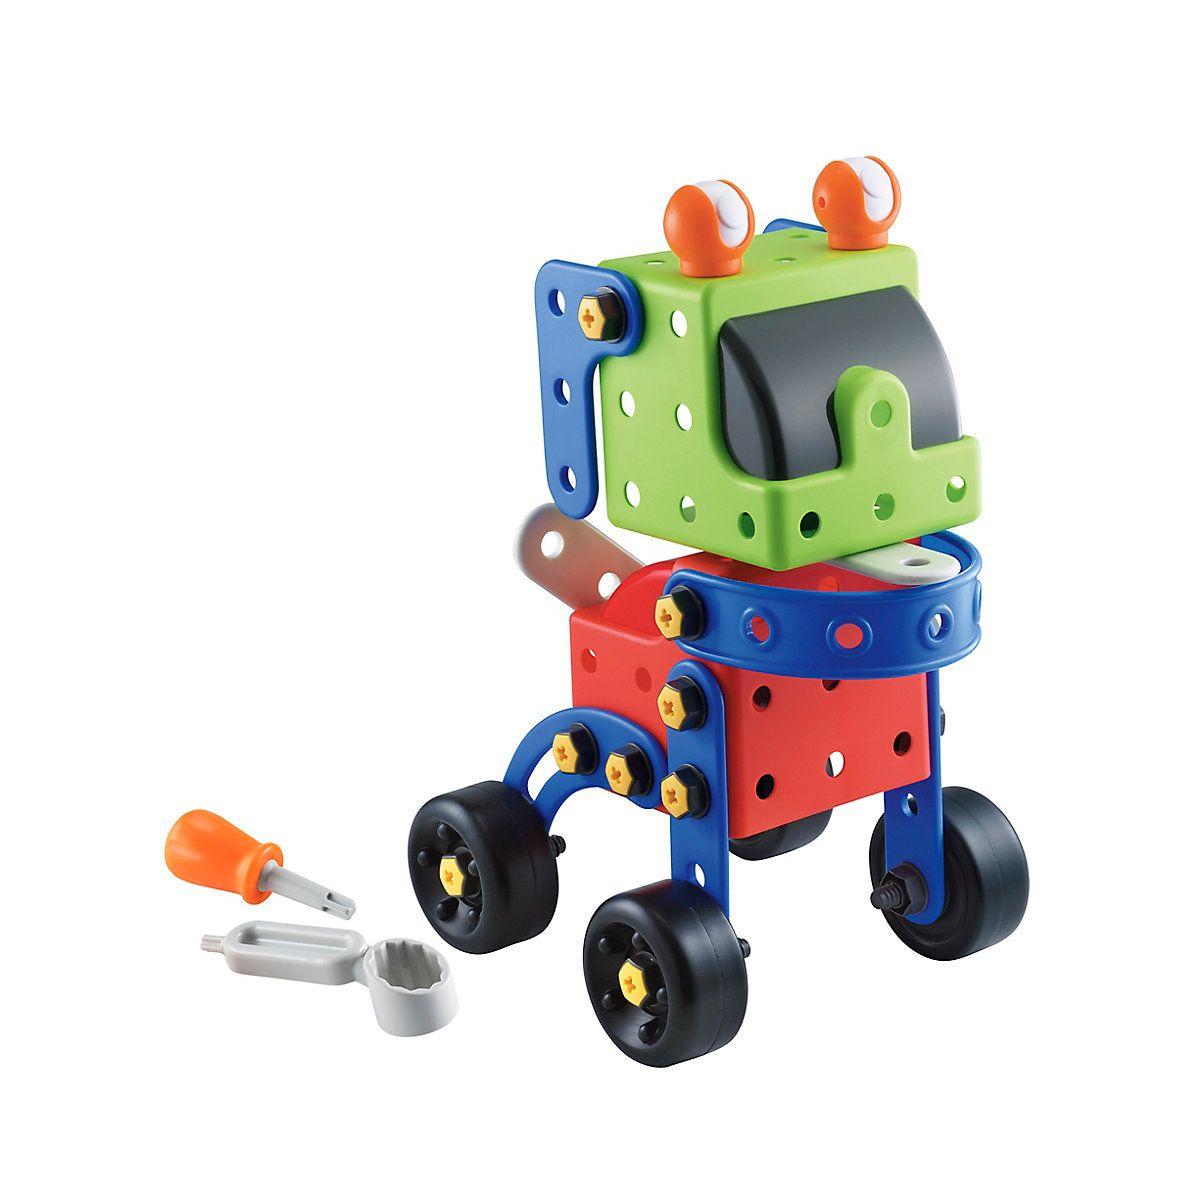 New ELC Build It Construction Starter Set Toy • £40.00 - PicClick UK ...